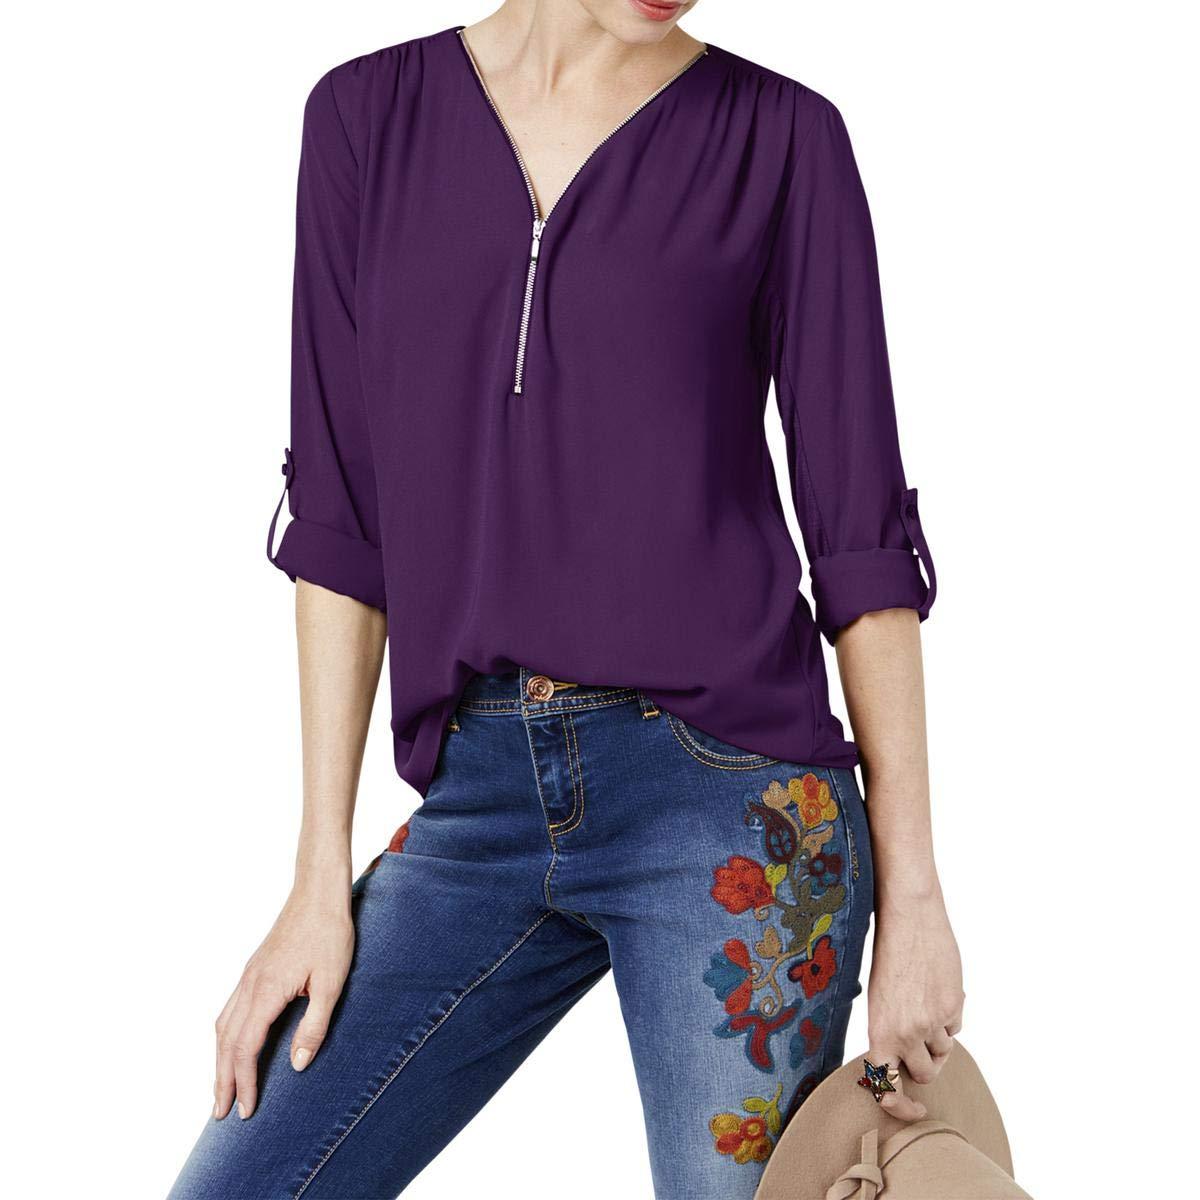 Purpleparadise INC Womens Mixed Media Utility Knit Blouse